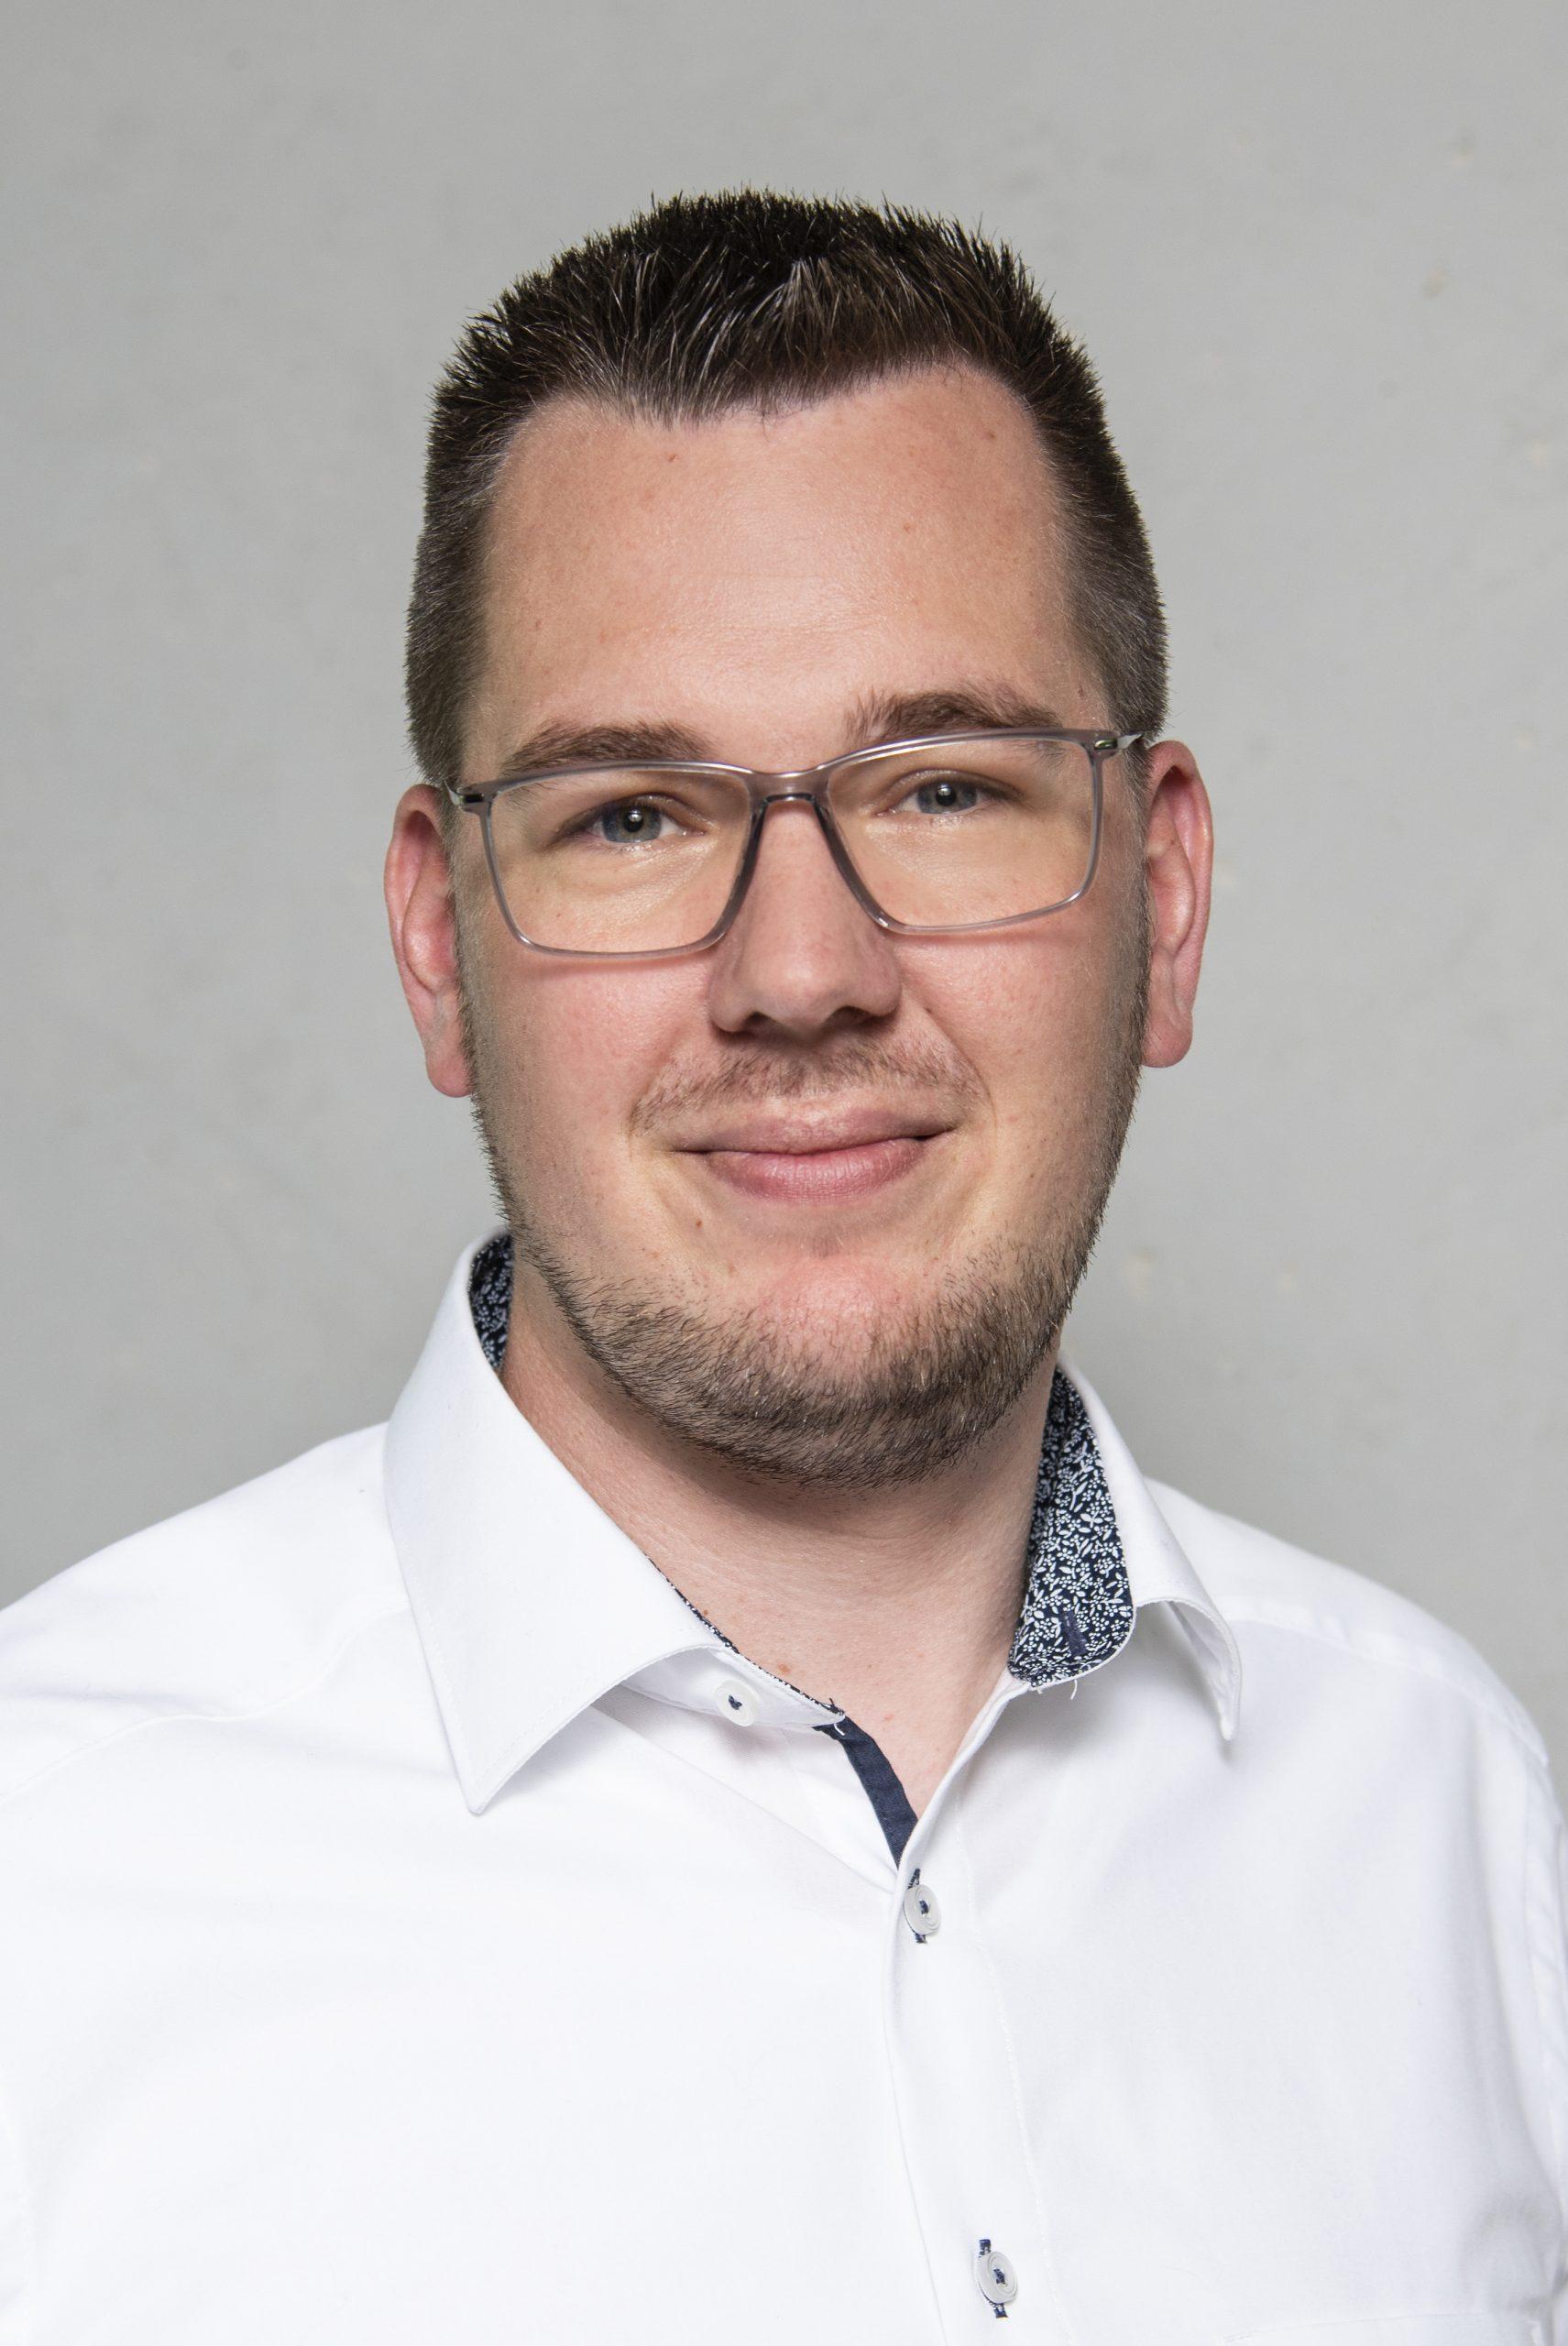 sekulak-stephan-projektleitung-hls-ingenieurgesellschaft-druecke